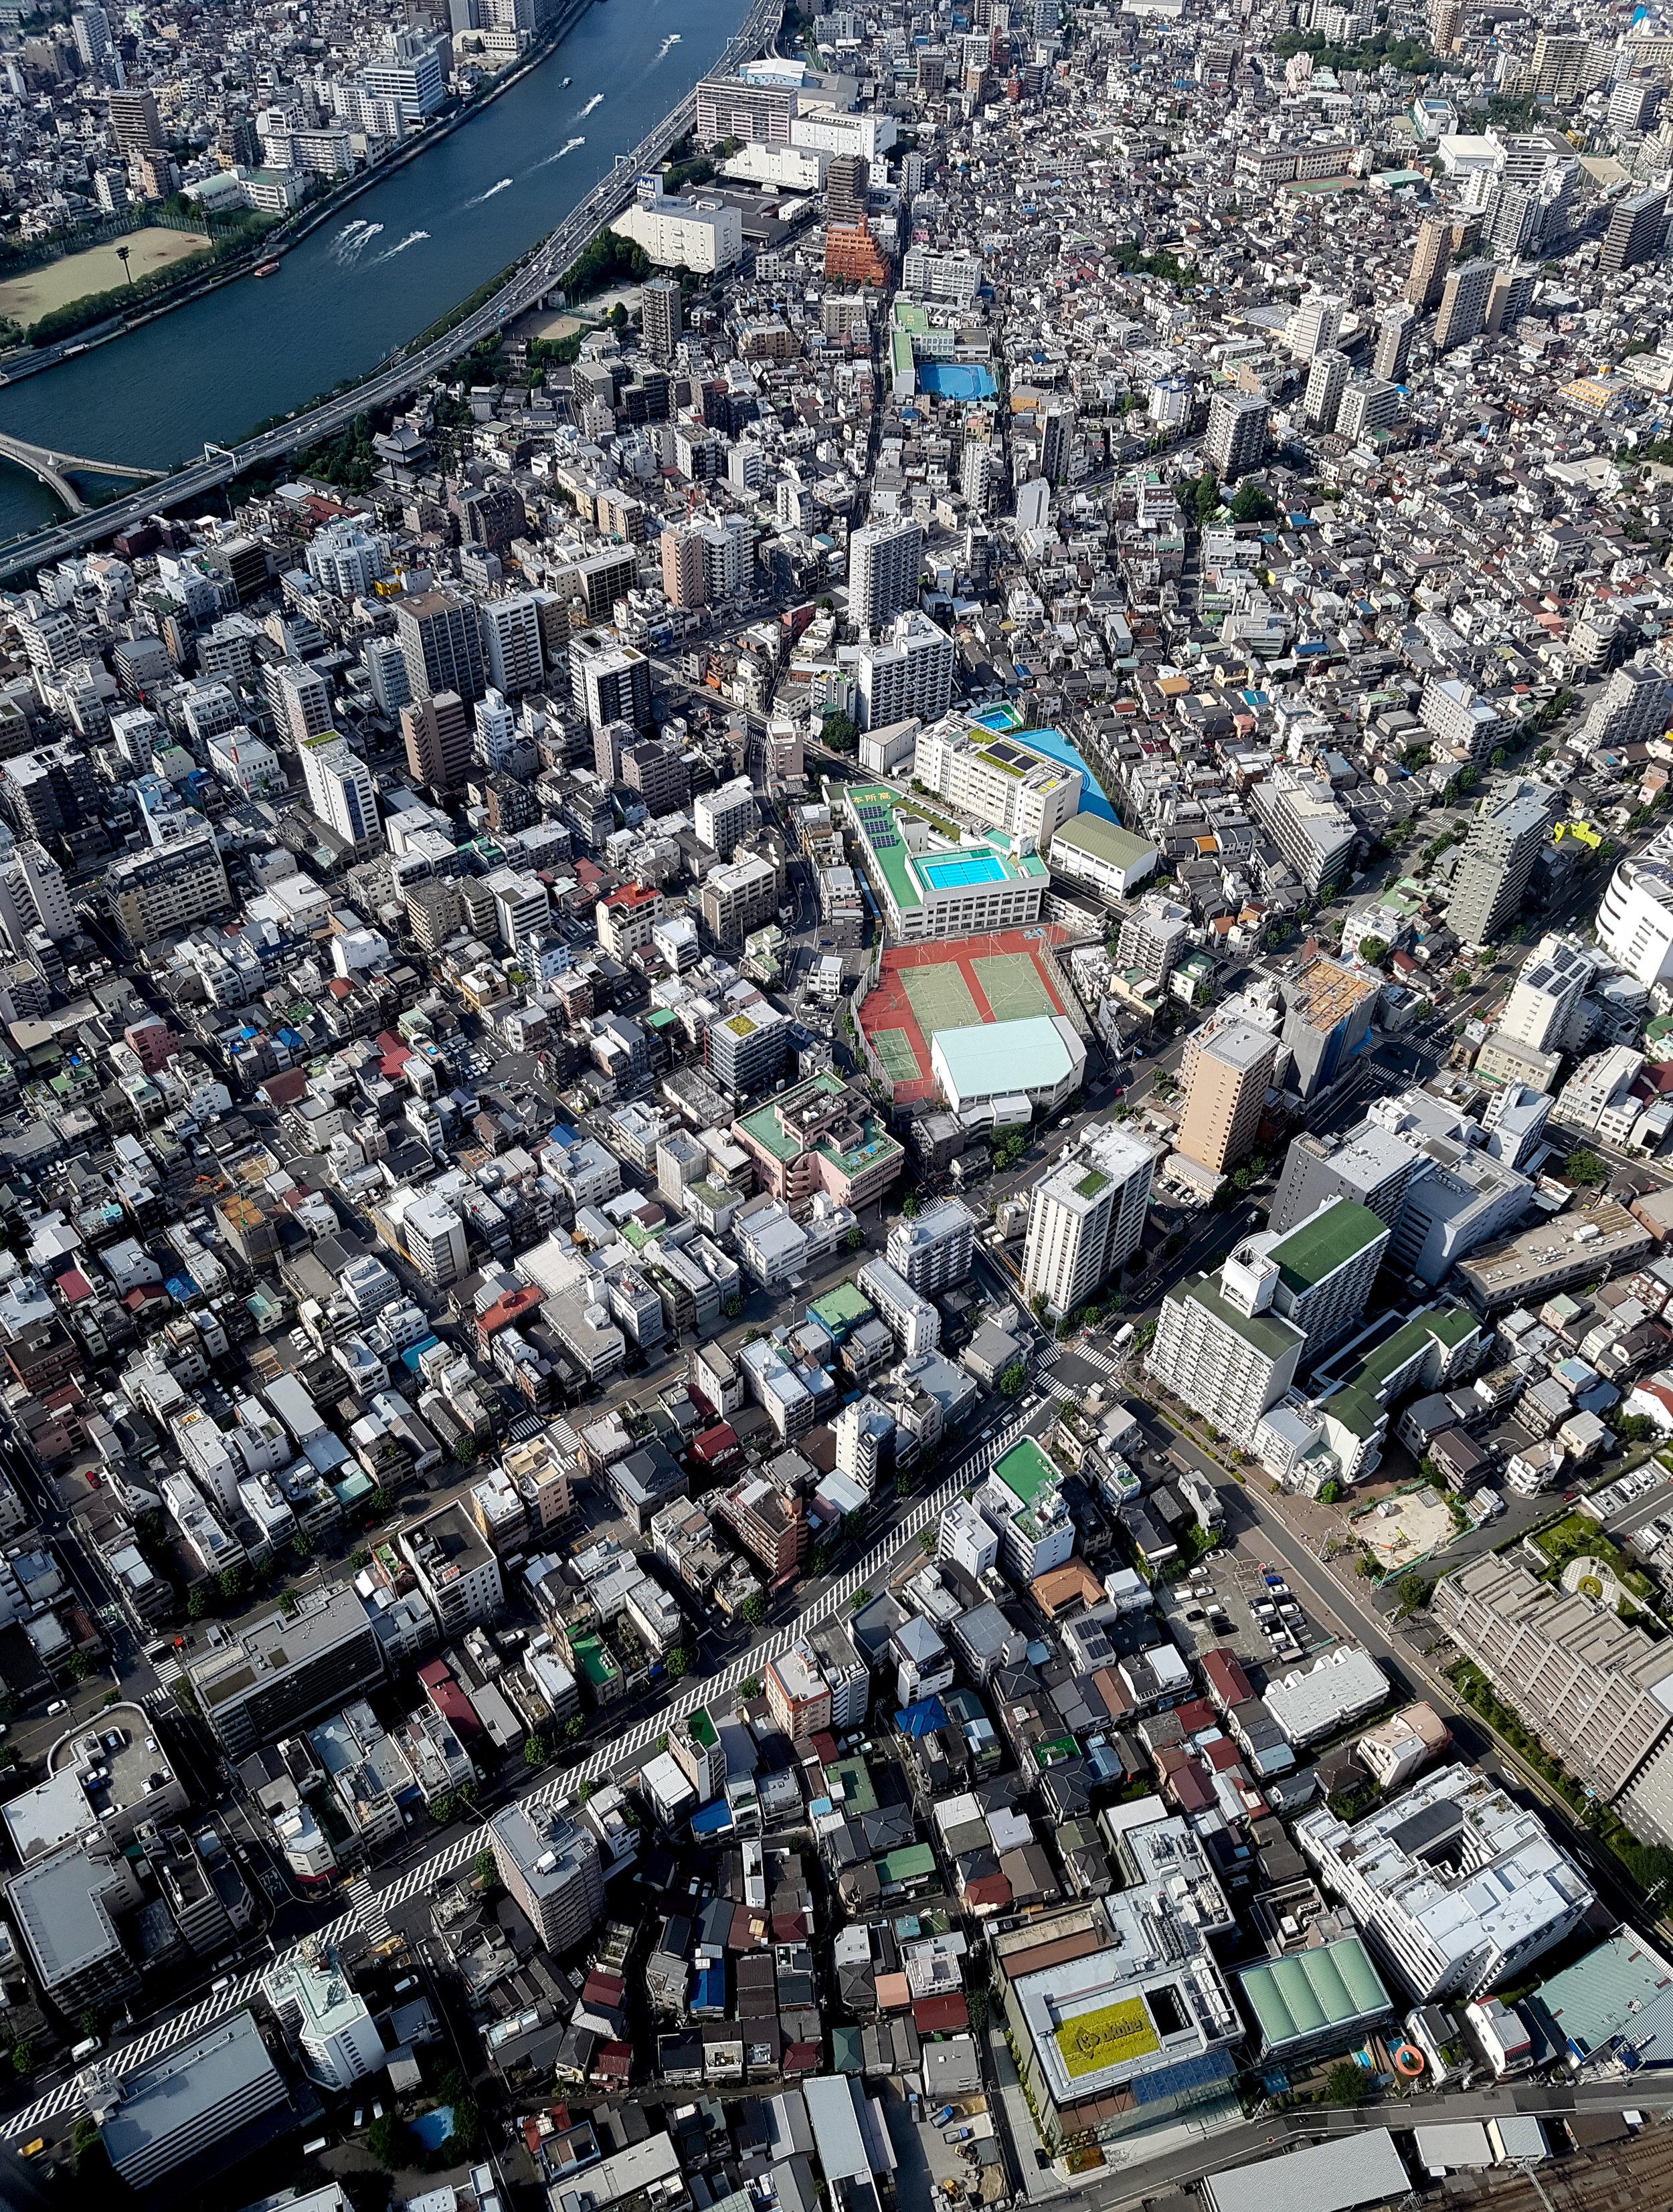 TOKYO - Mike Dugenio (1).jpg